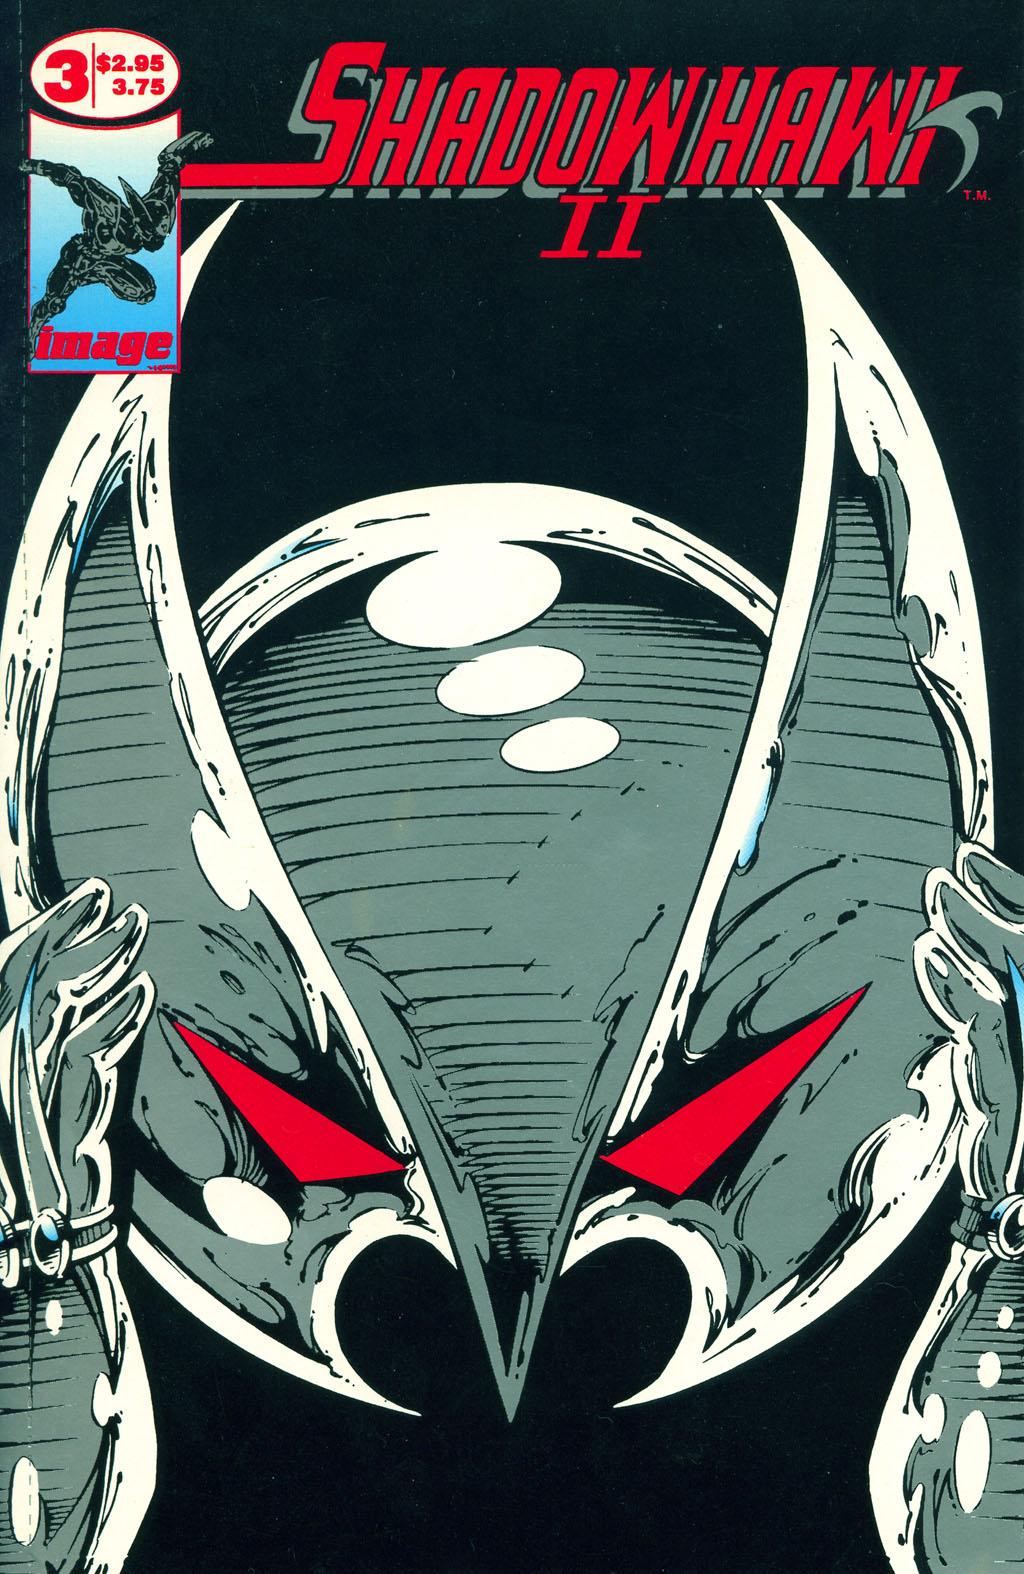 Read online ShadowHawk comic -  Issue #7 - 2